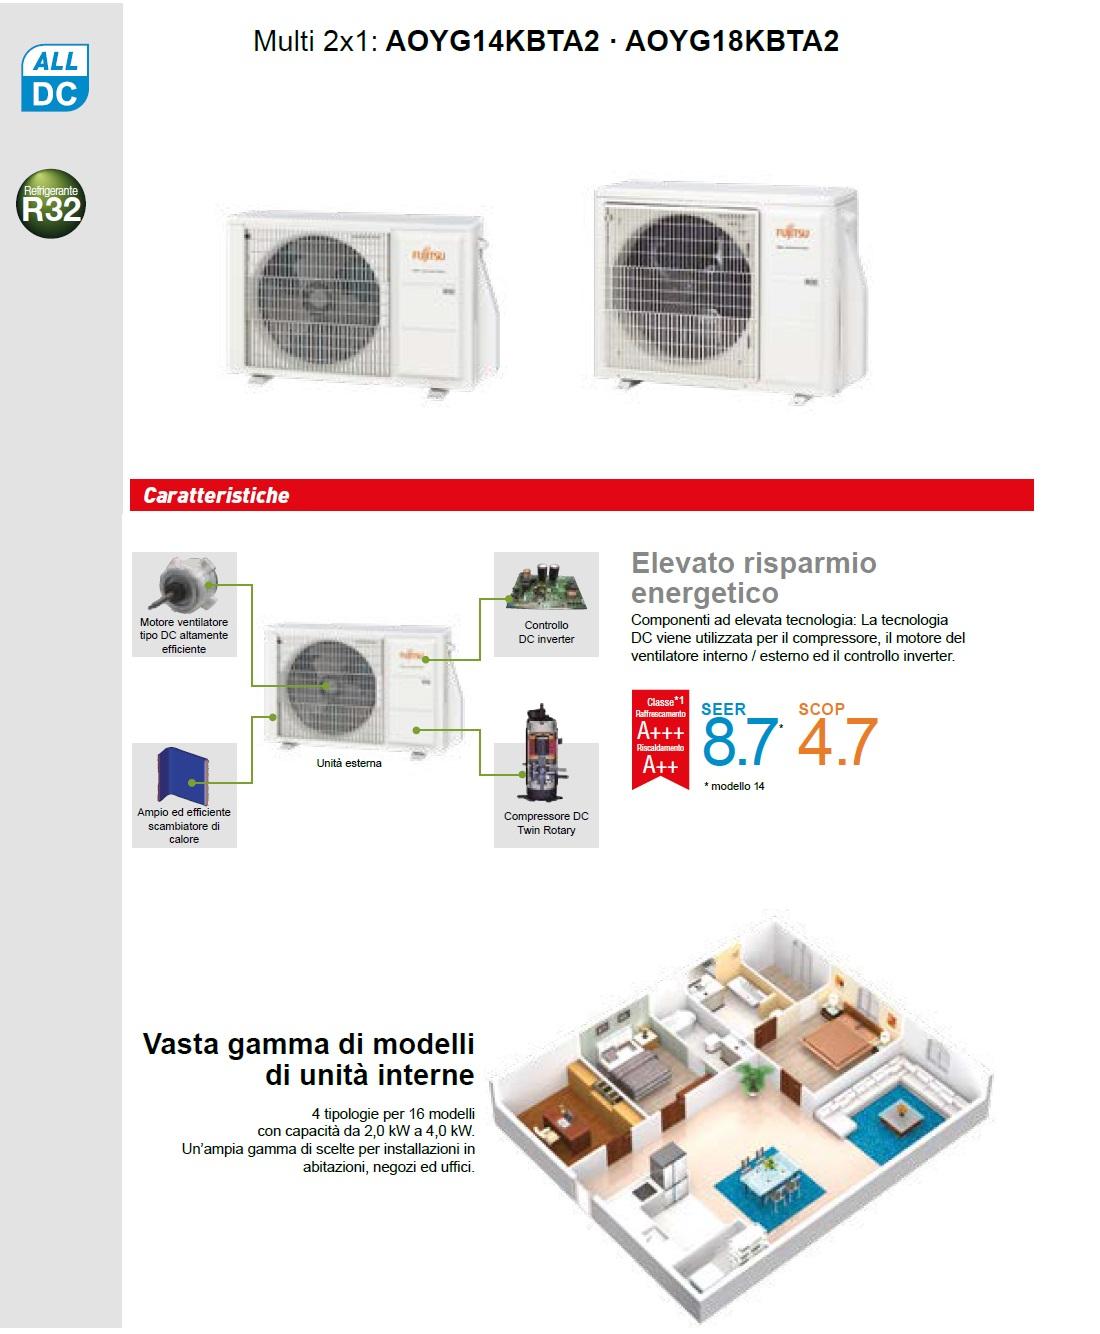 Climatizzatore Fujitsu Dual Split Parete 7+12 KE Bianco AOYG18KBTA2